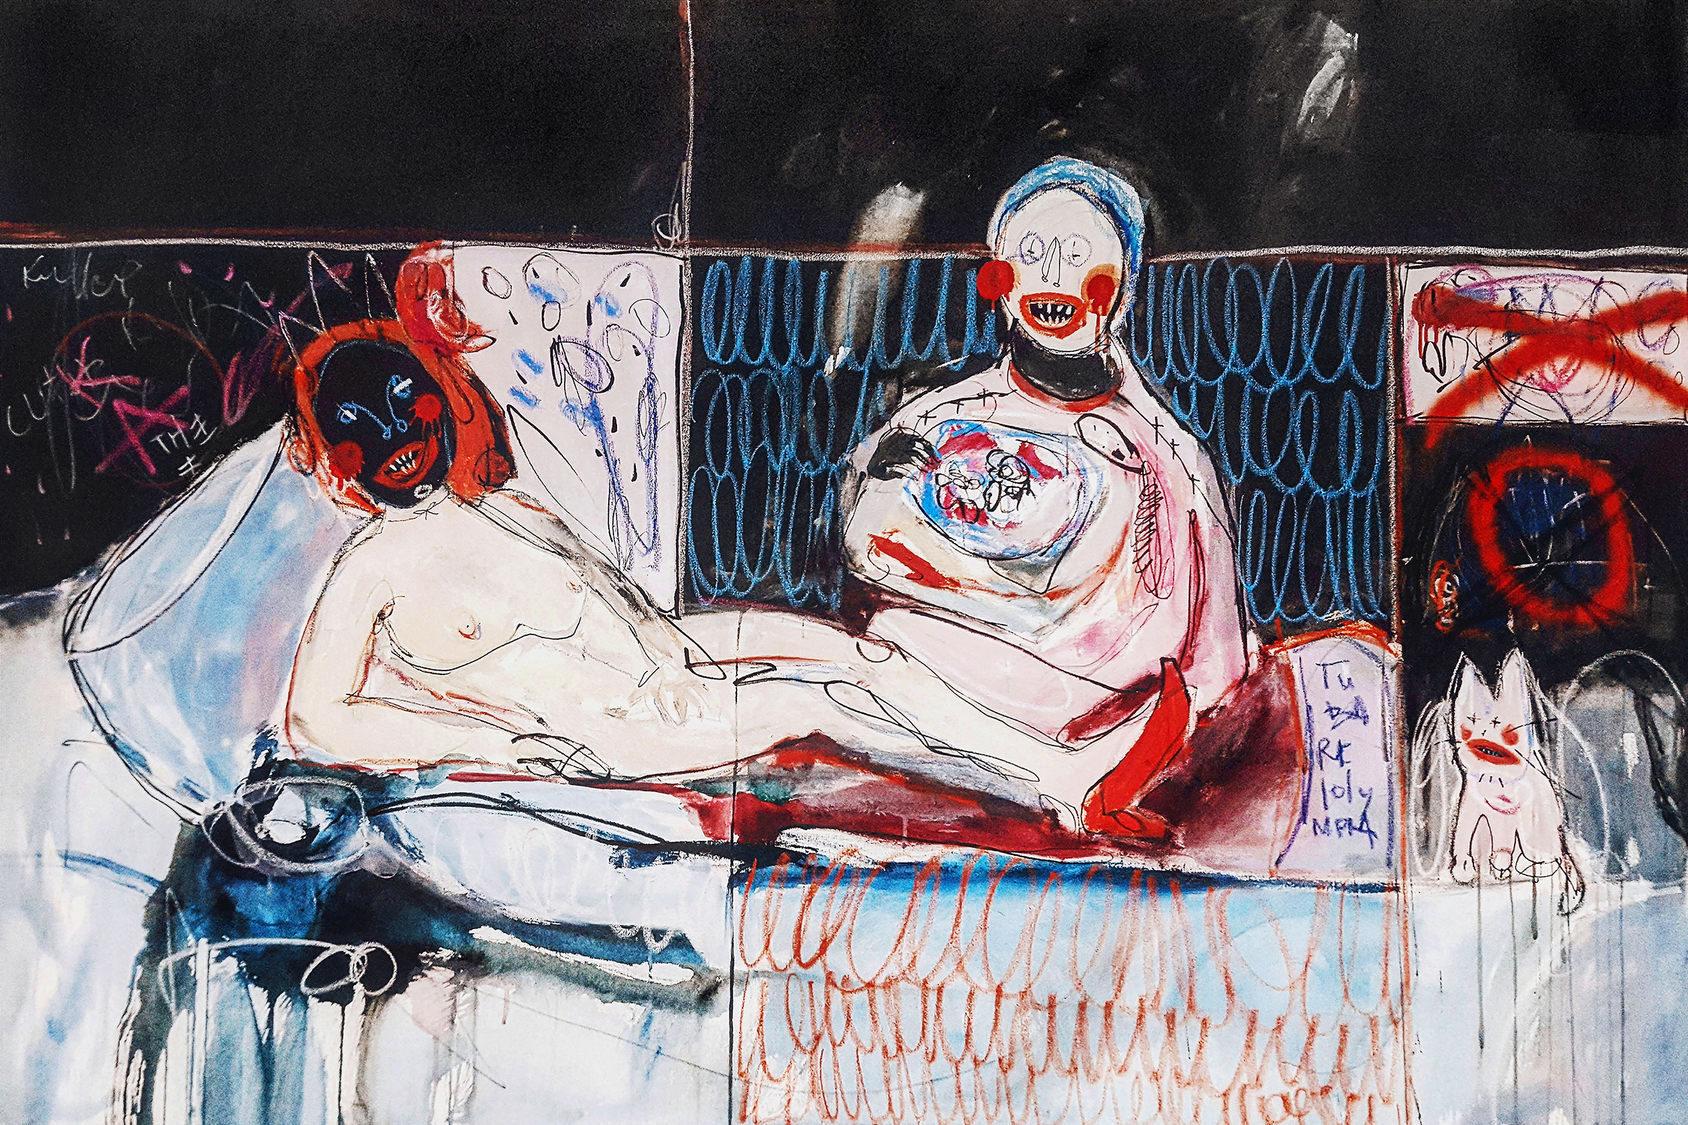 Lola , 100 x 150 cm, acrylic, spray paint, marker and oil pastel on canvas, 2016